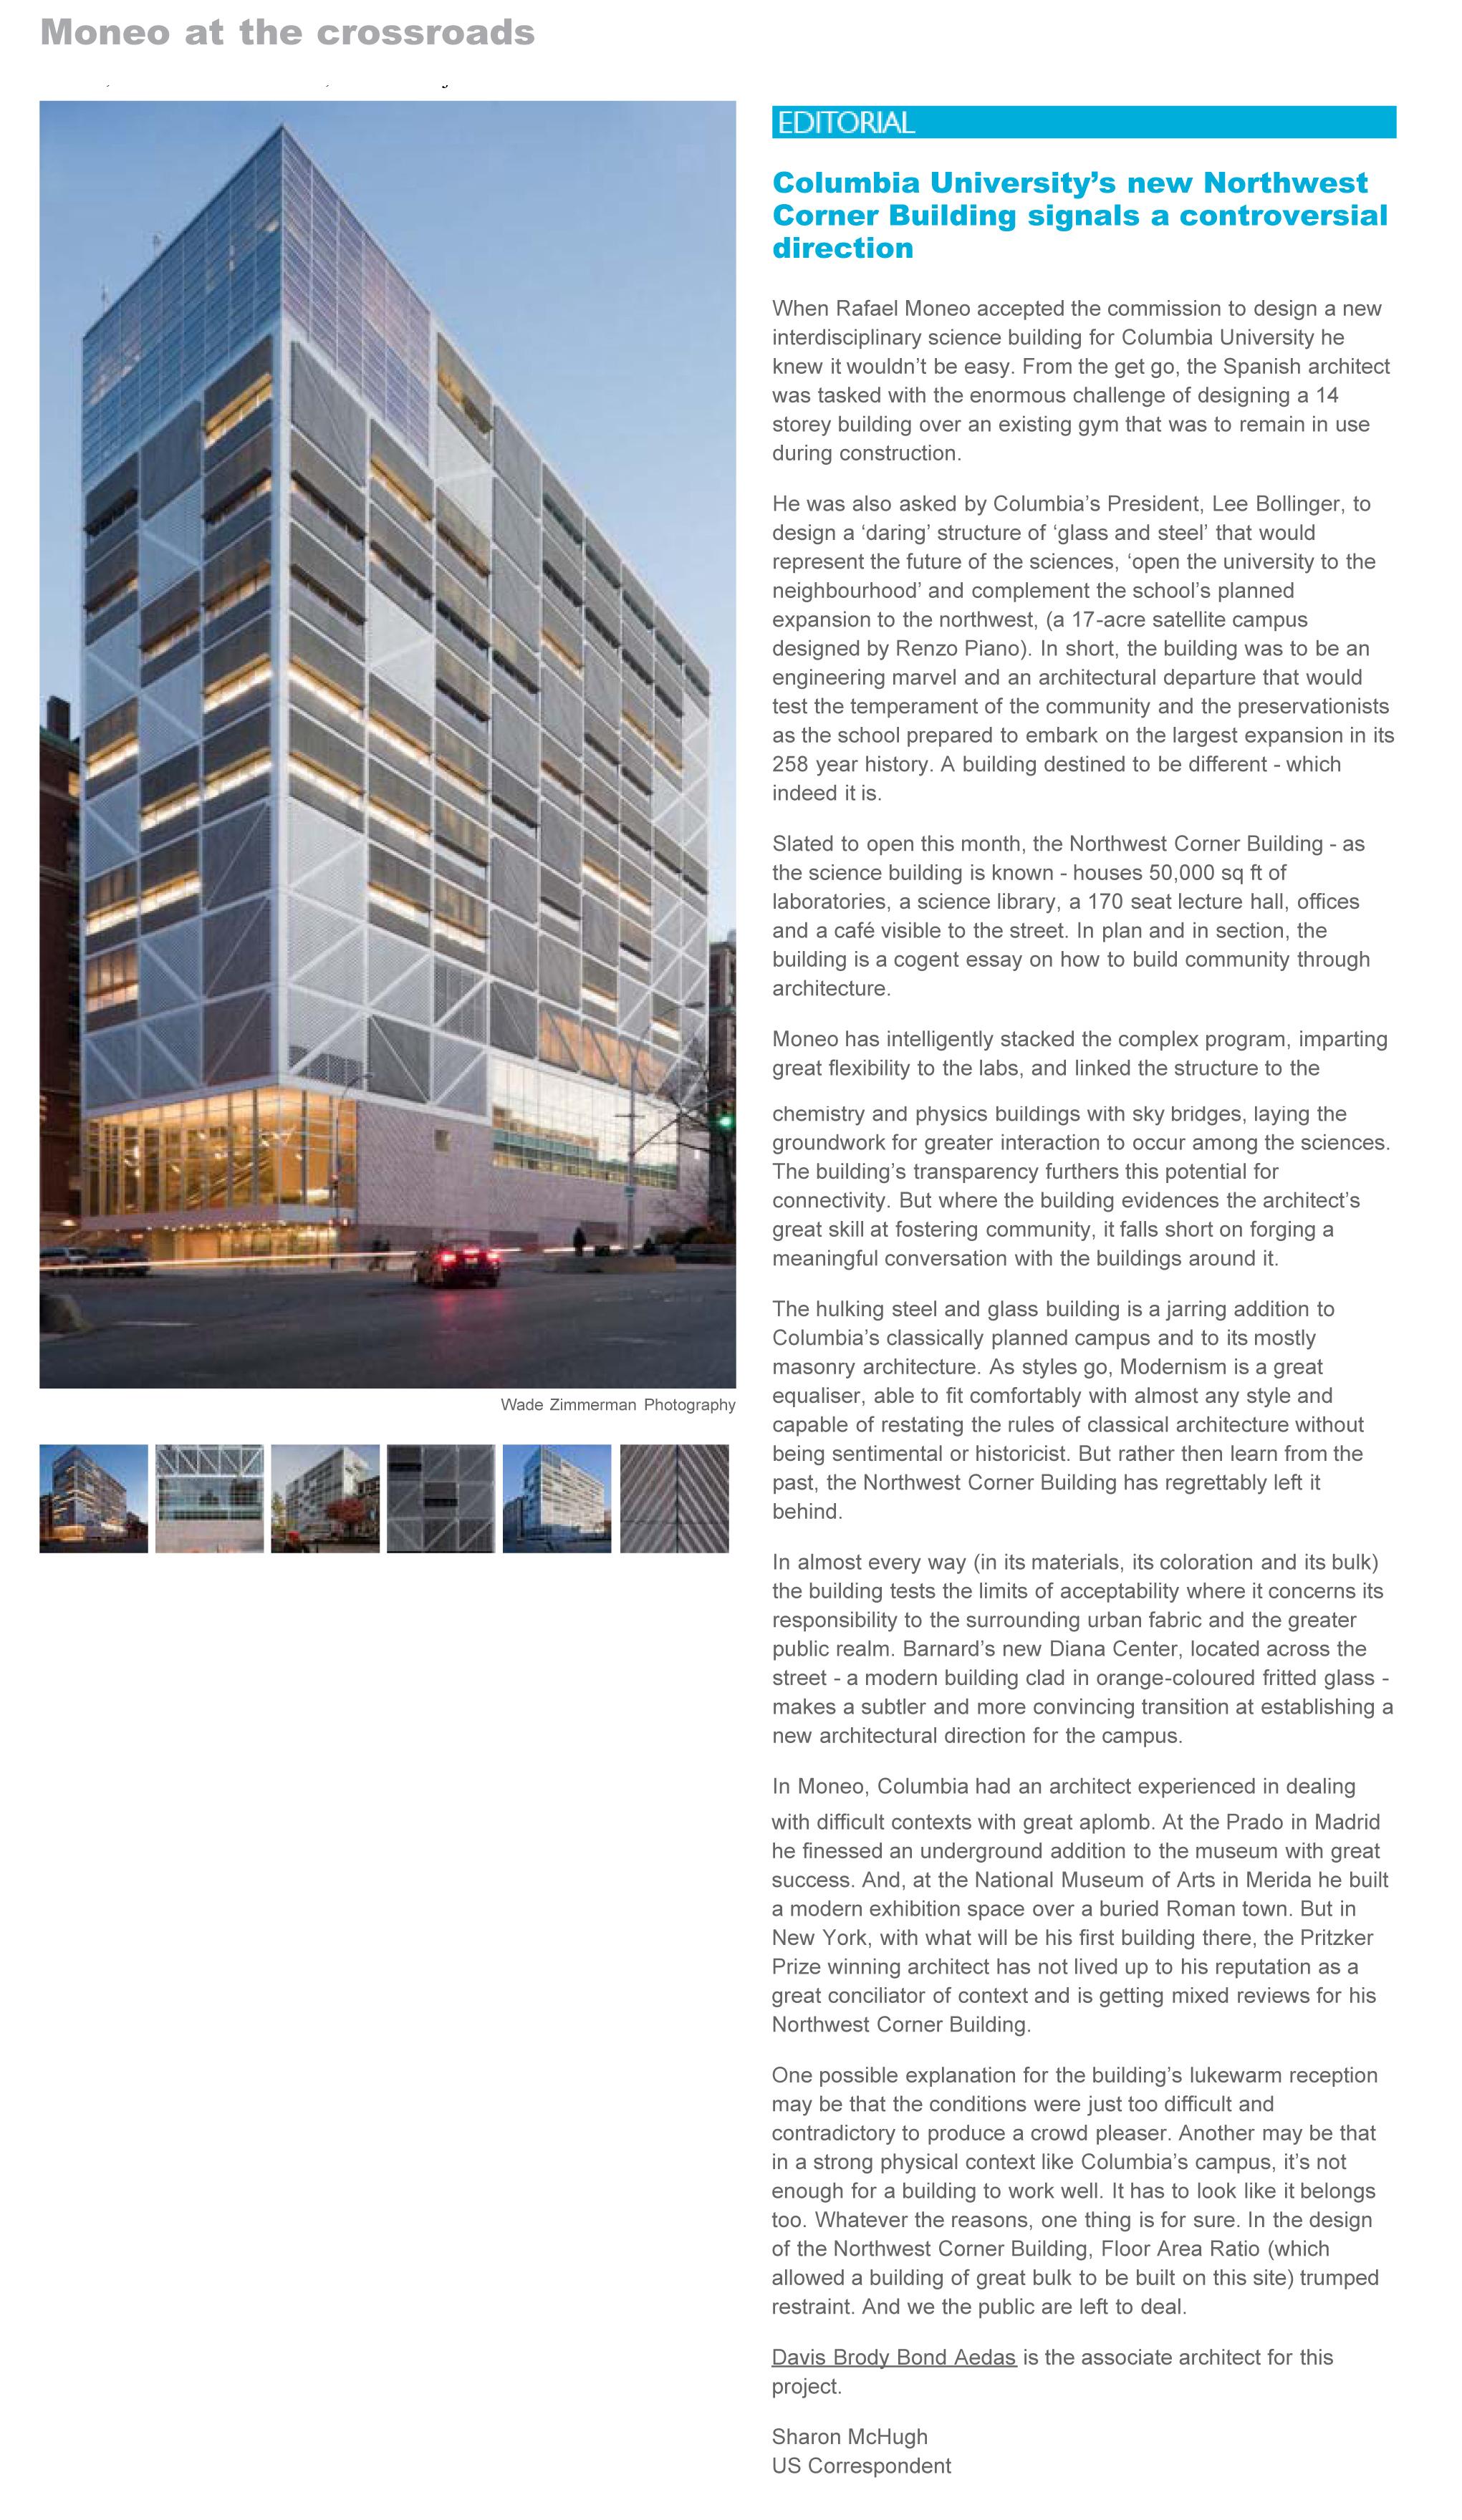 Northwest Corner Building, Columbia University, Rafael Moneo, wo